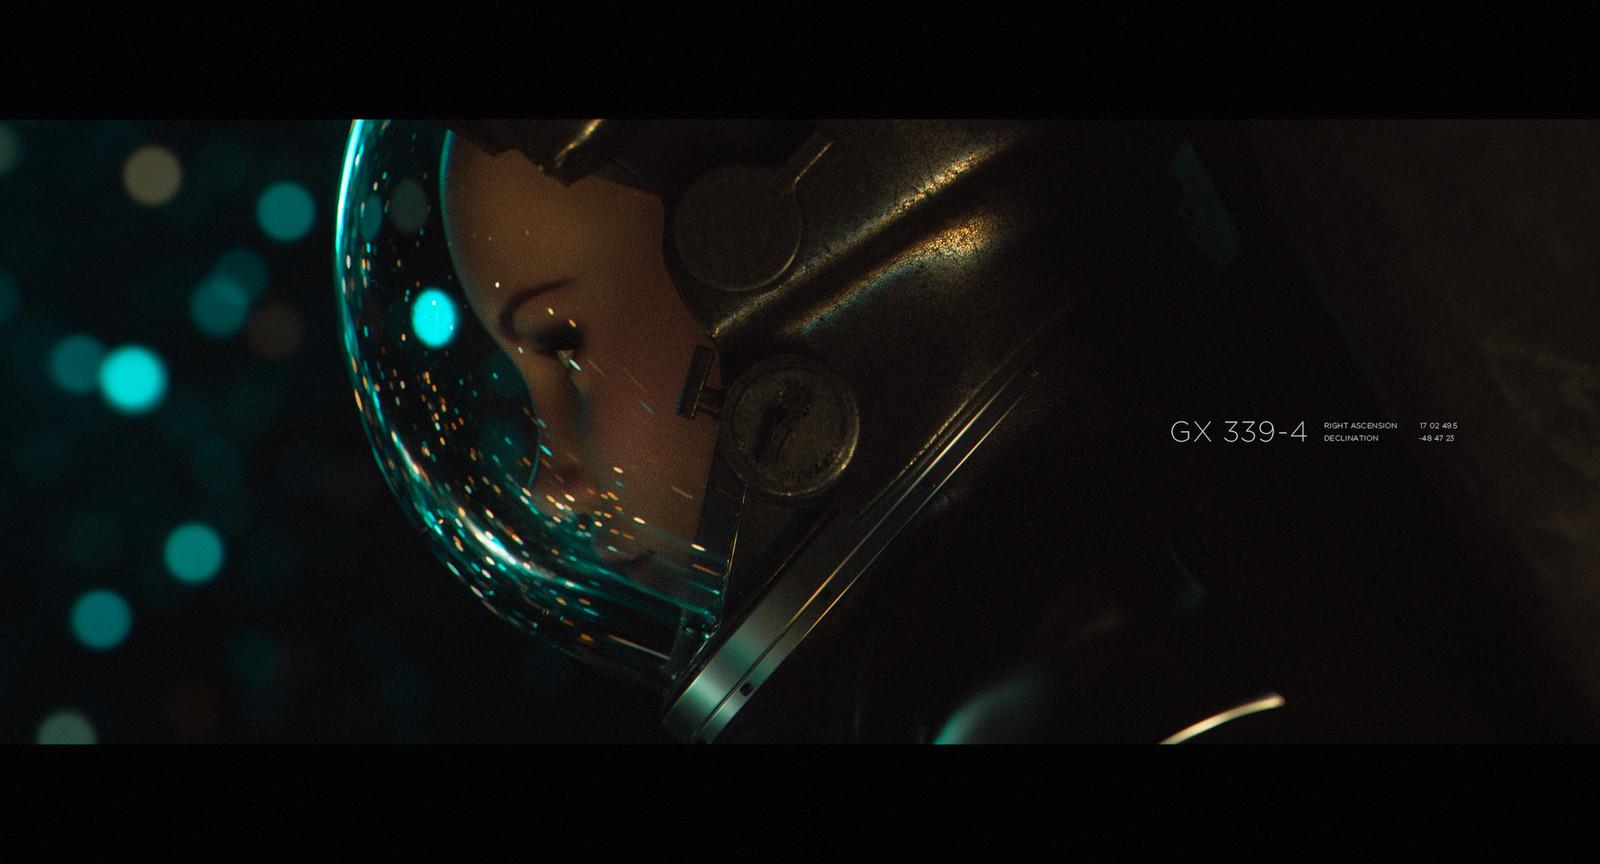 GX 339-4